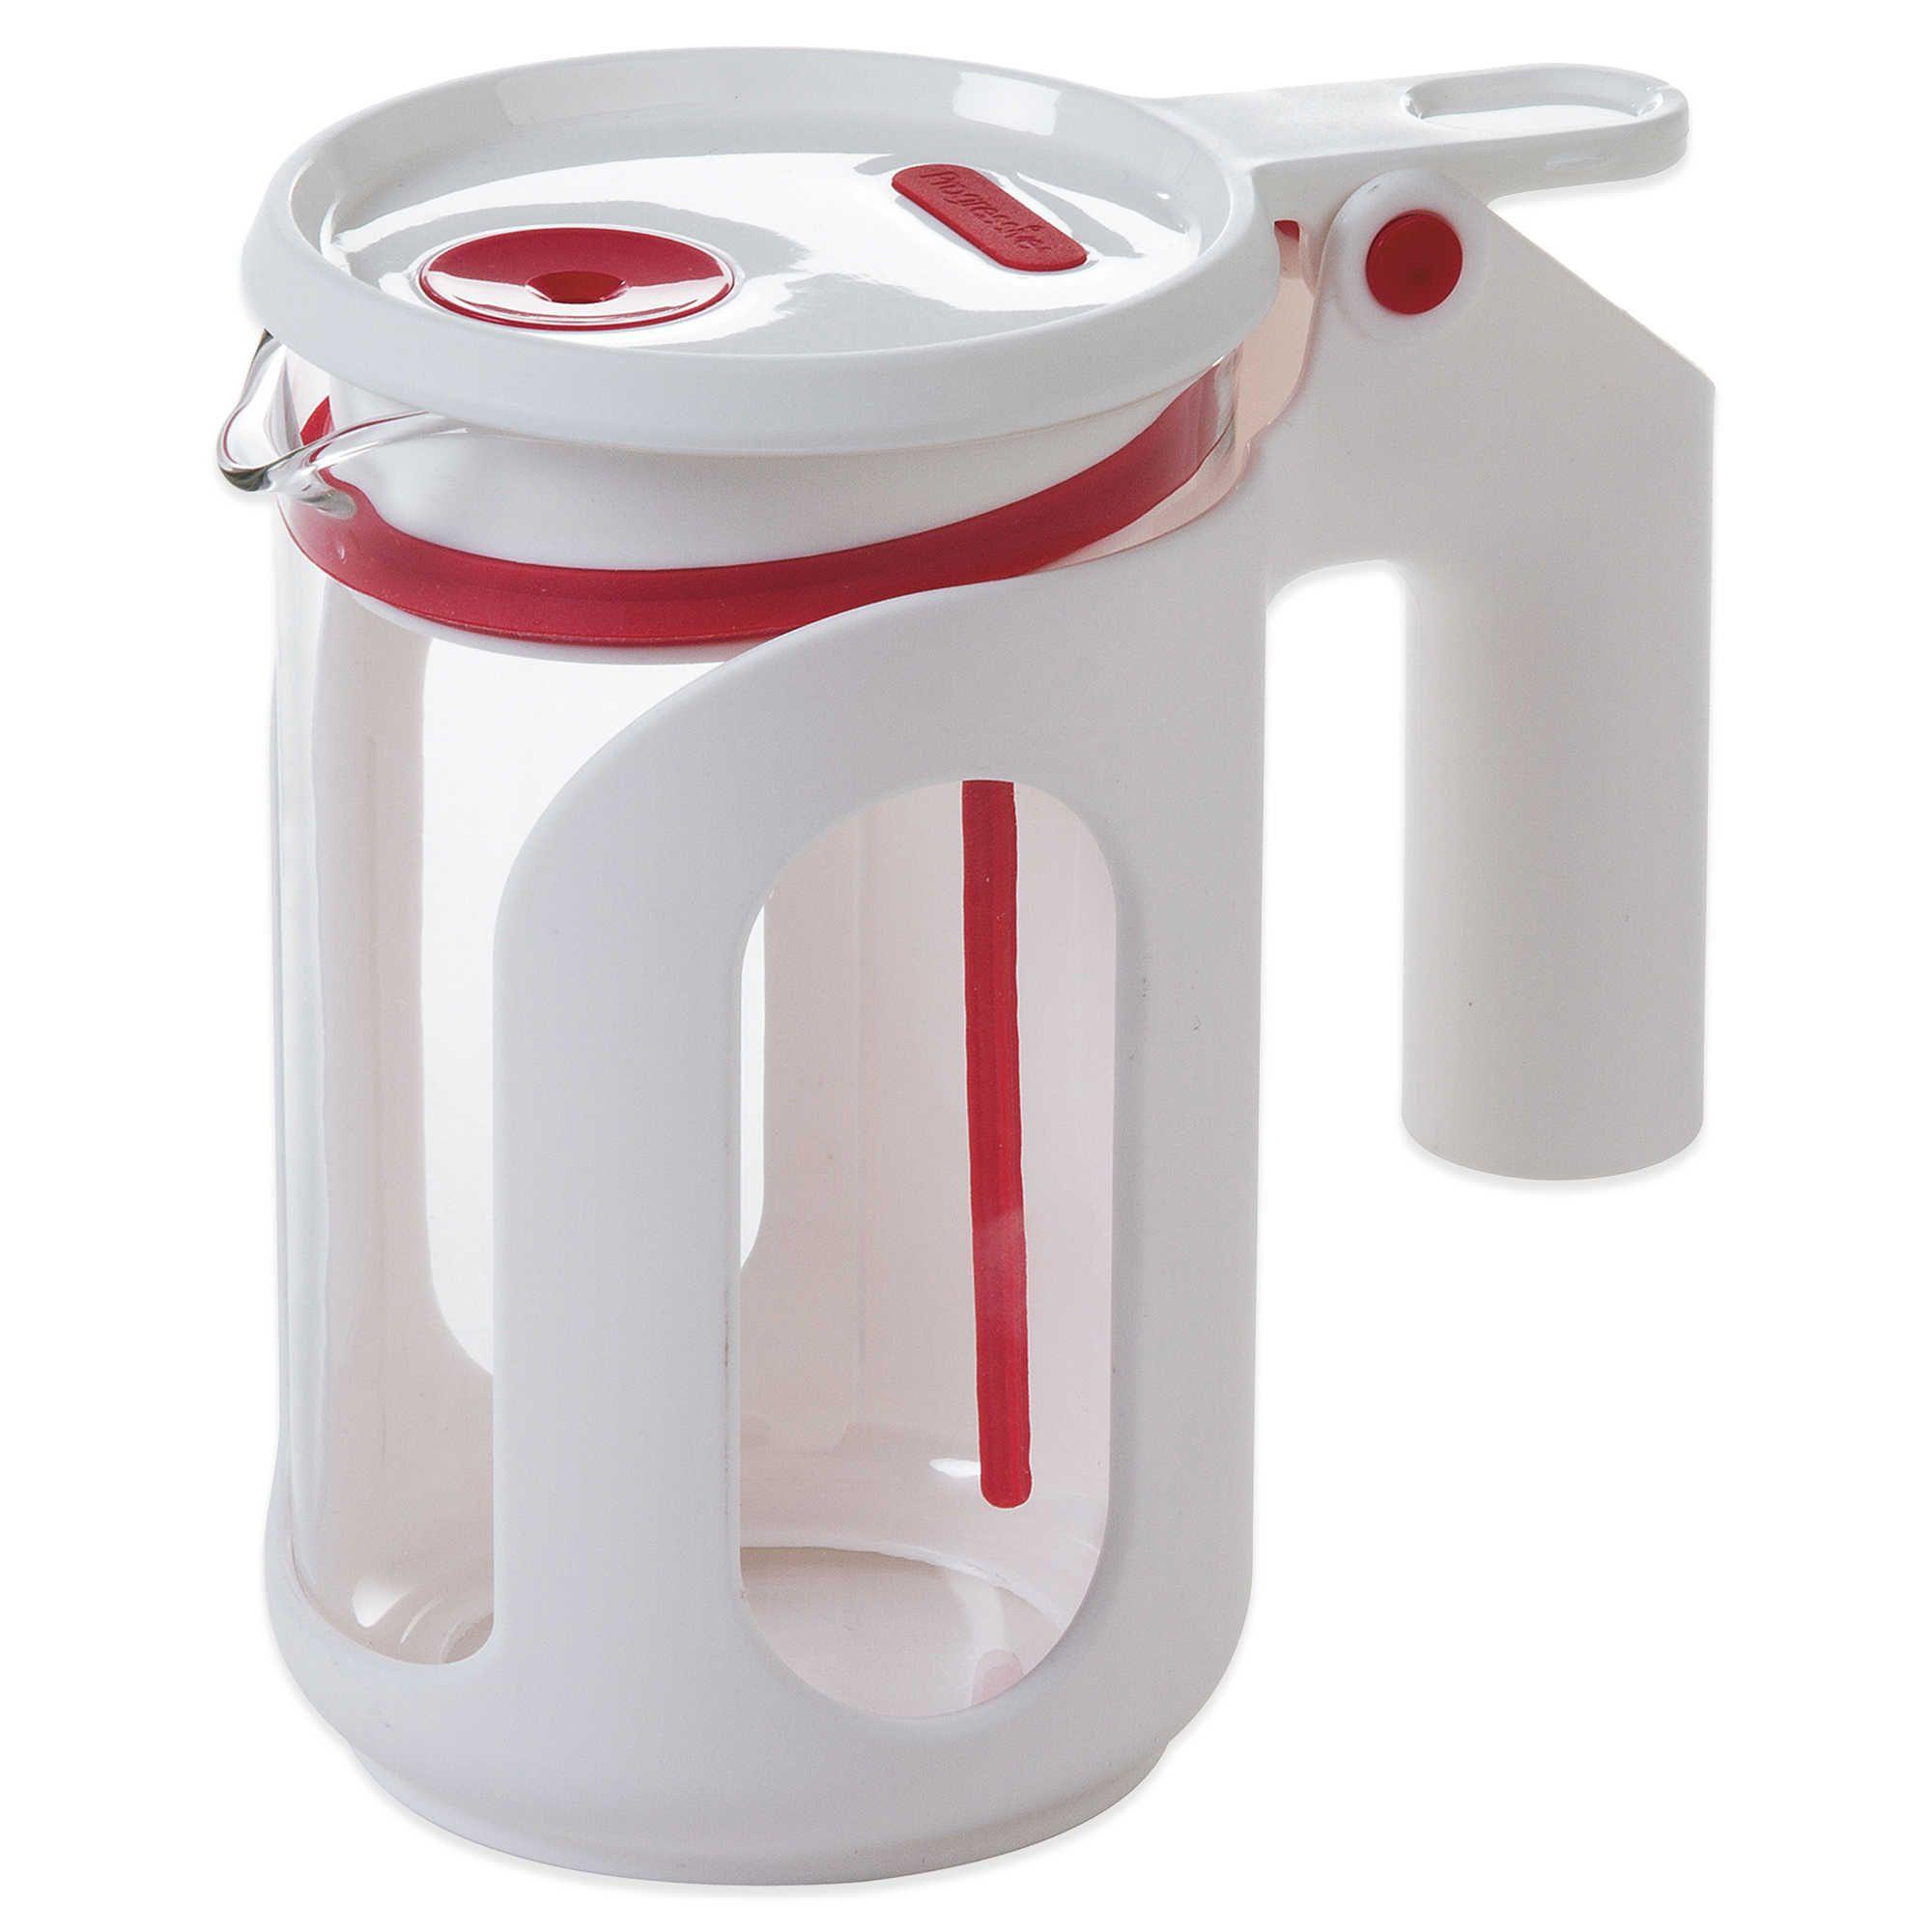 Progressive® 25 oz. Whistling Microwave Tea Kettle in Red